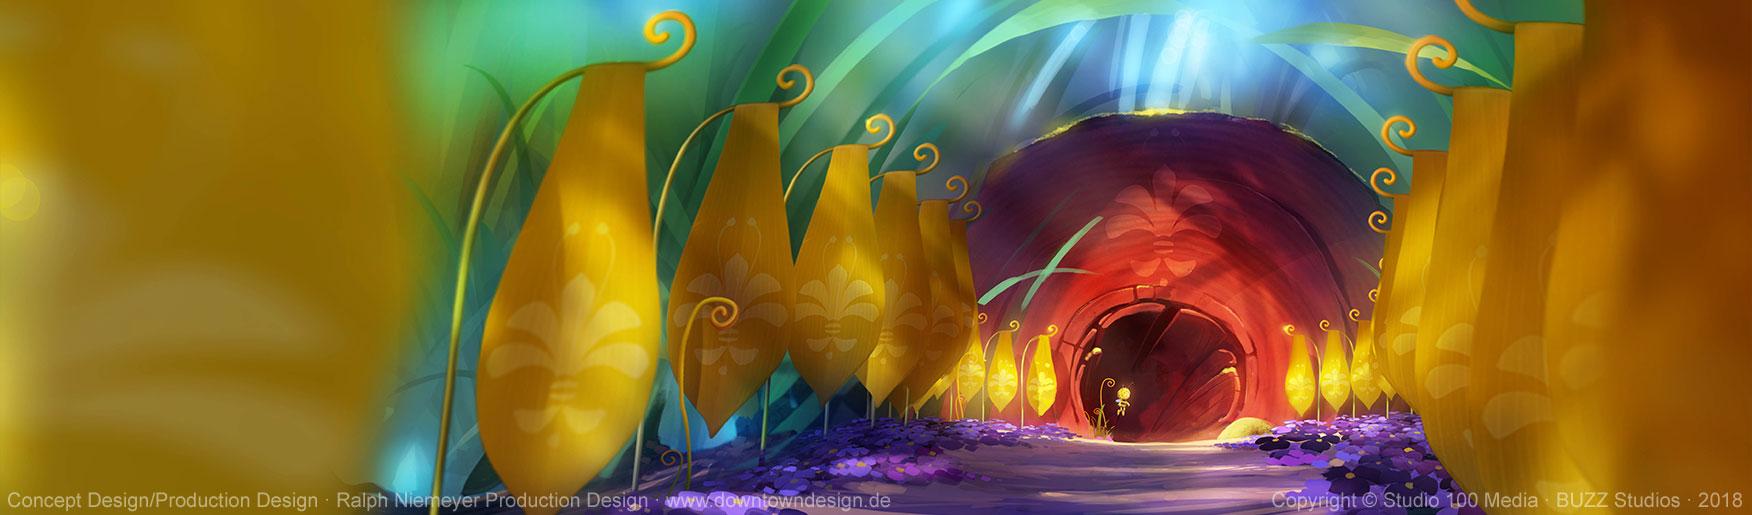 die-biene-maja-2-die-honigspiele-concept-art-ralph-niemeyer-arena-entrance